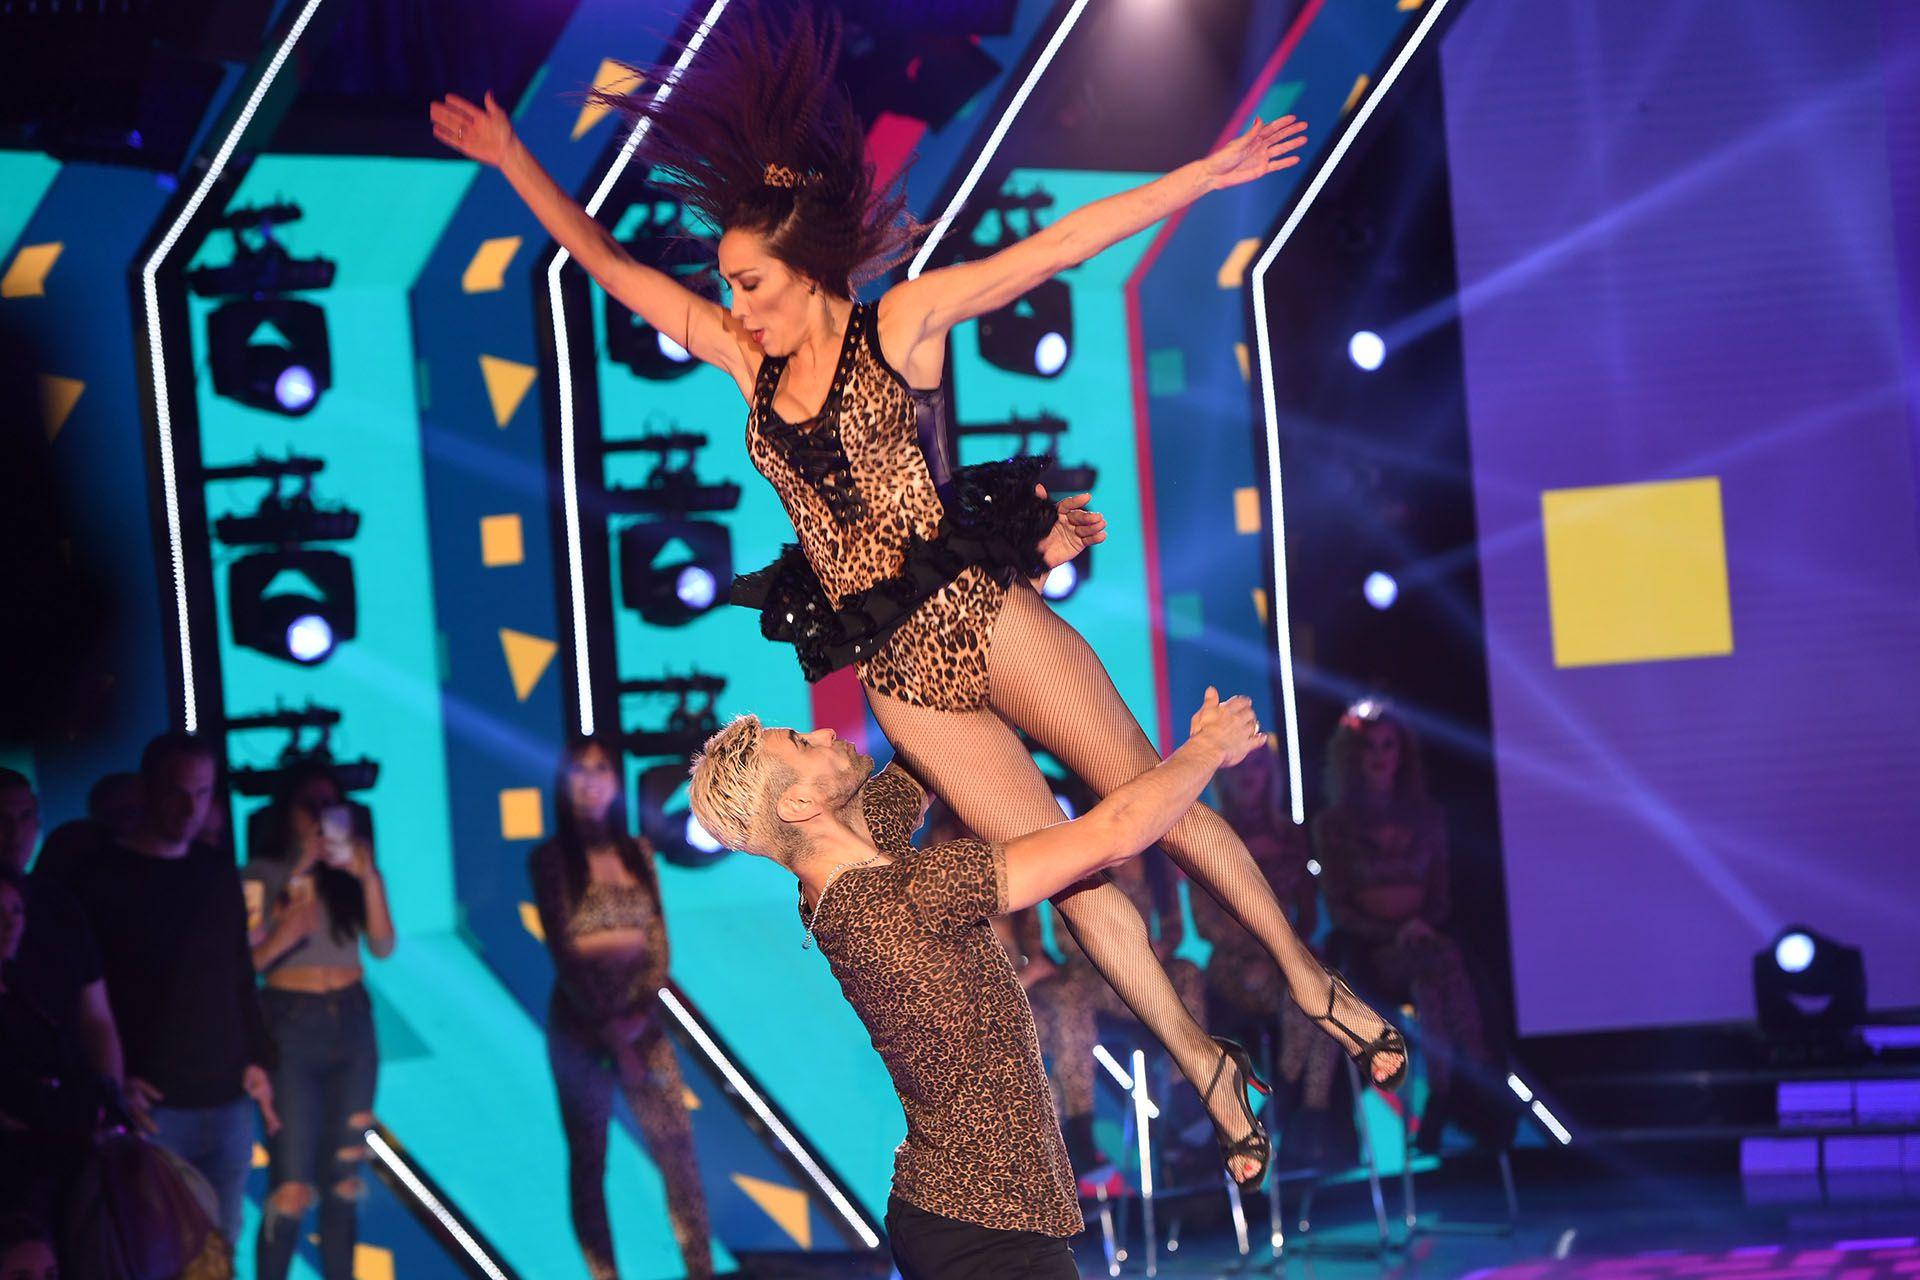 La pareja bailó un tema de Rodrigo Bueno